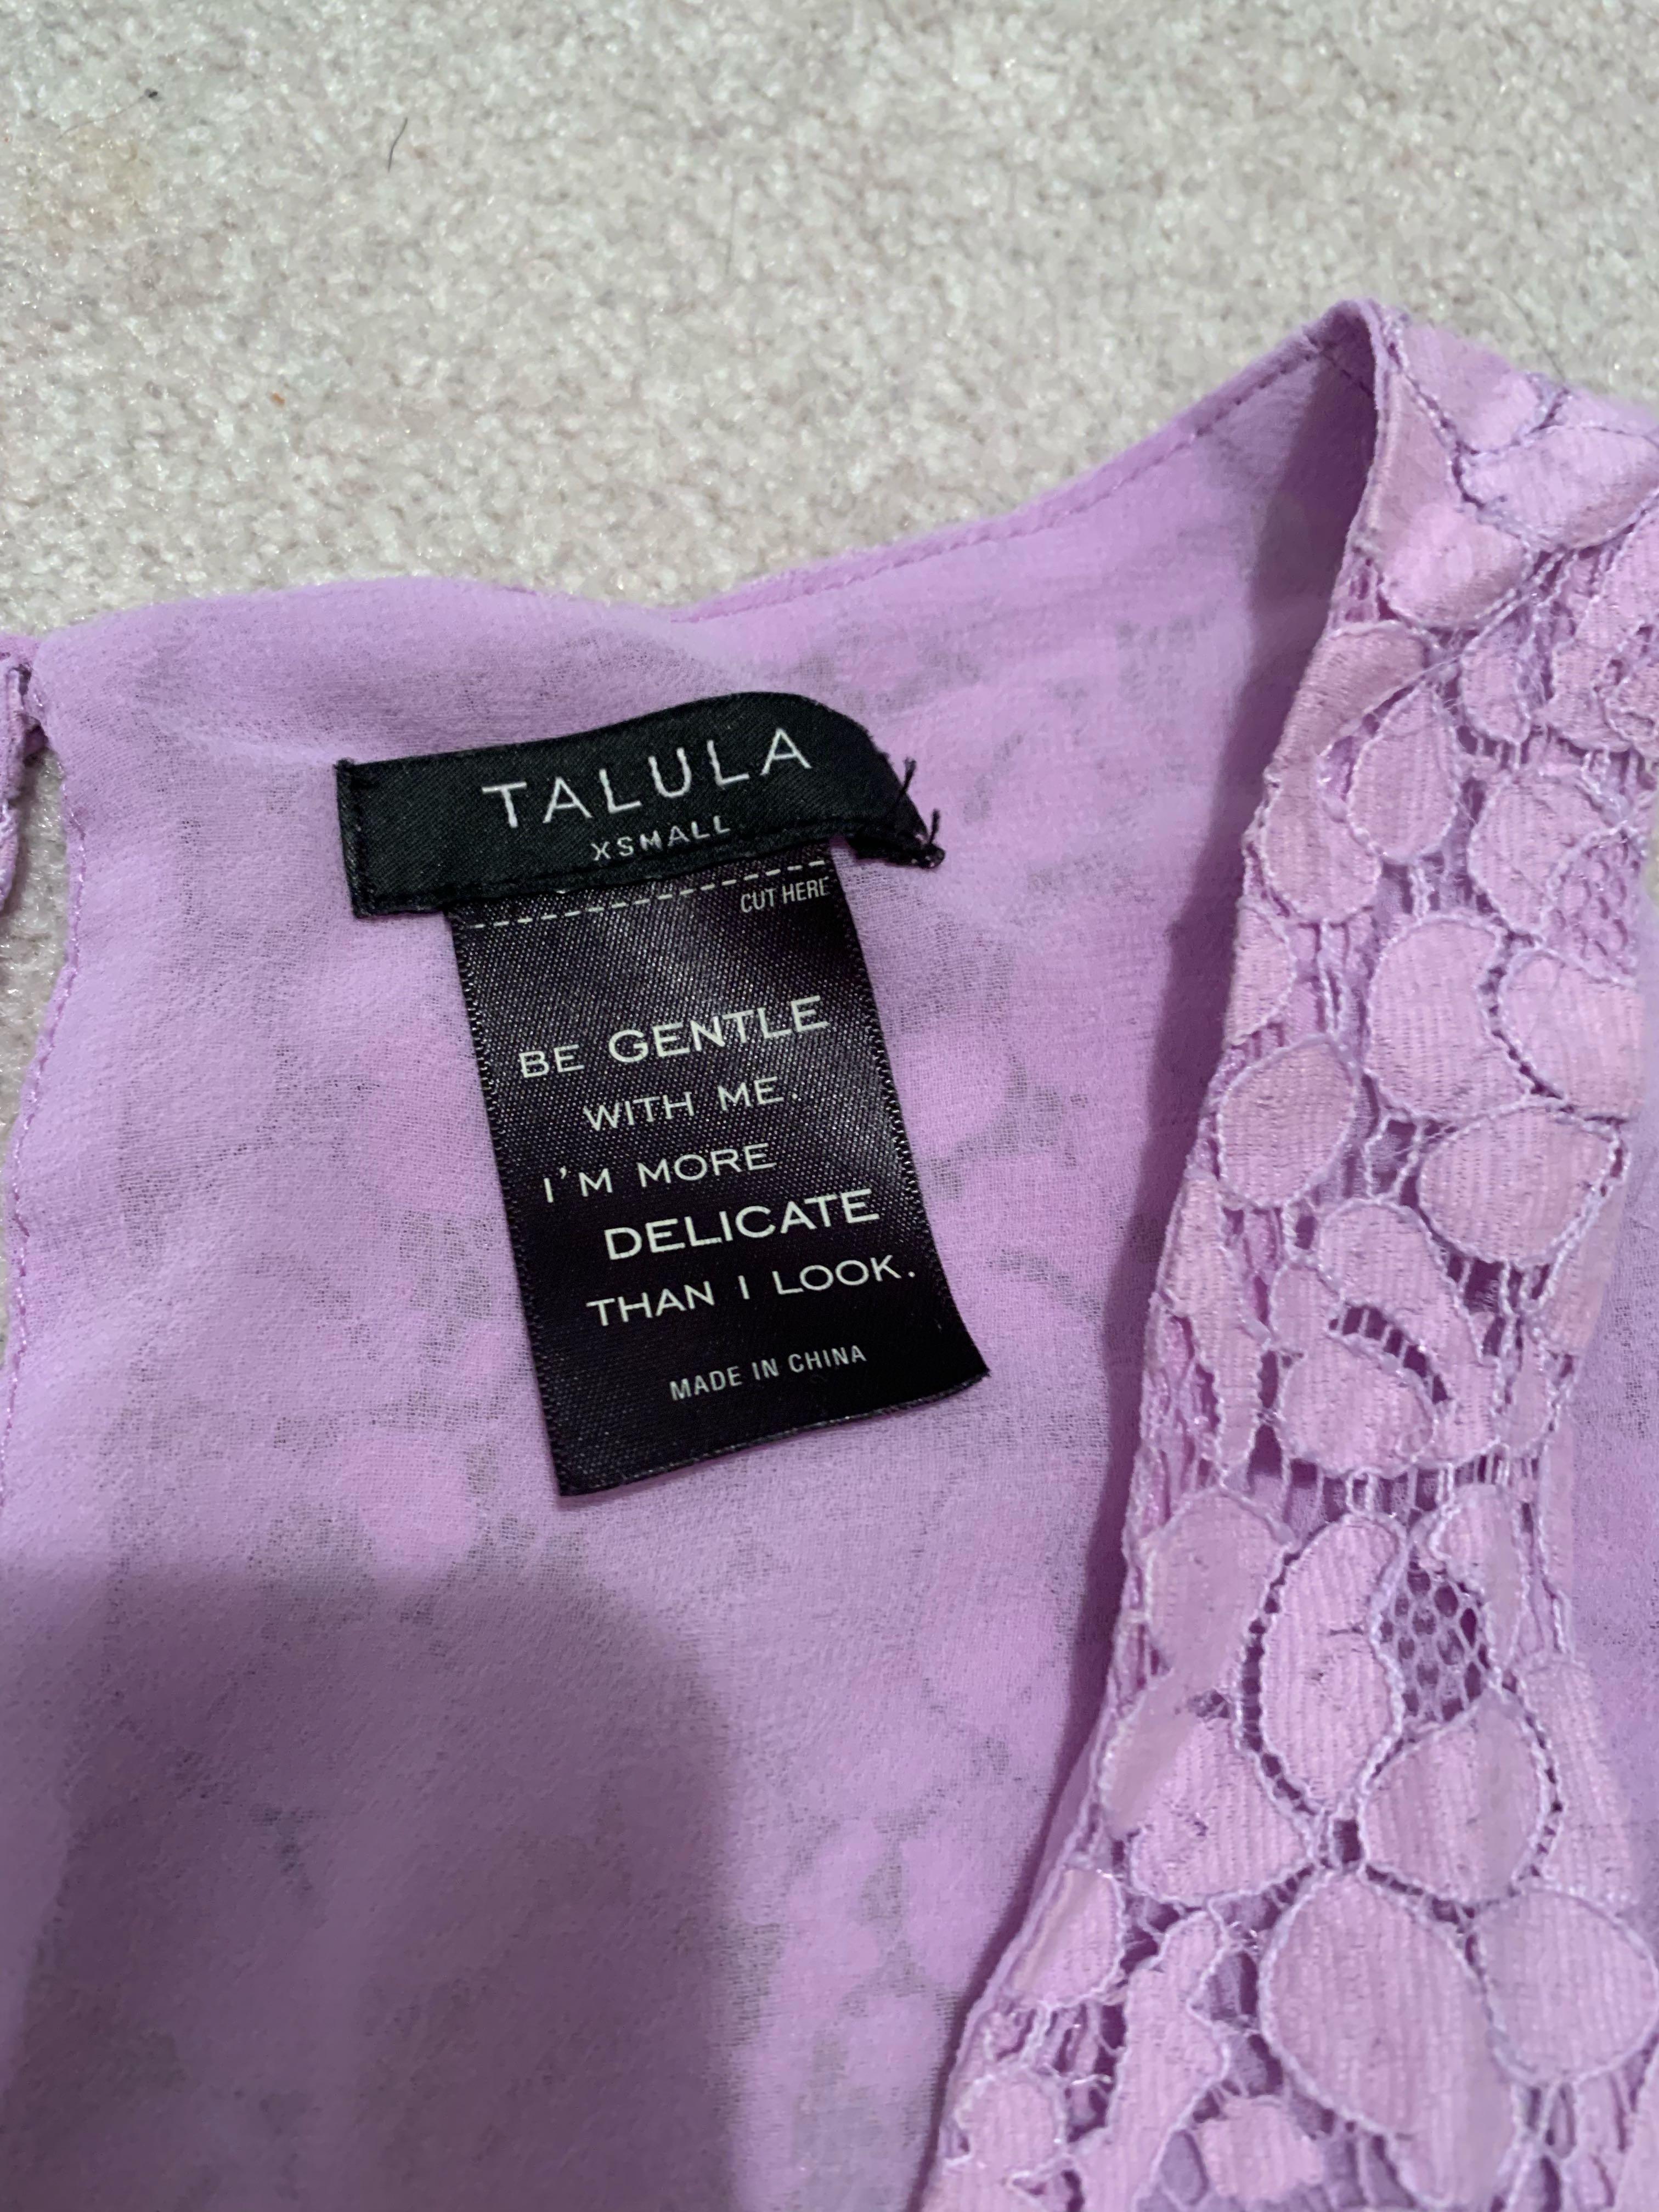 Lavender Talula Aritzia lace tank top